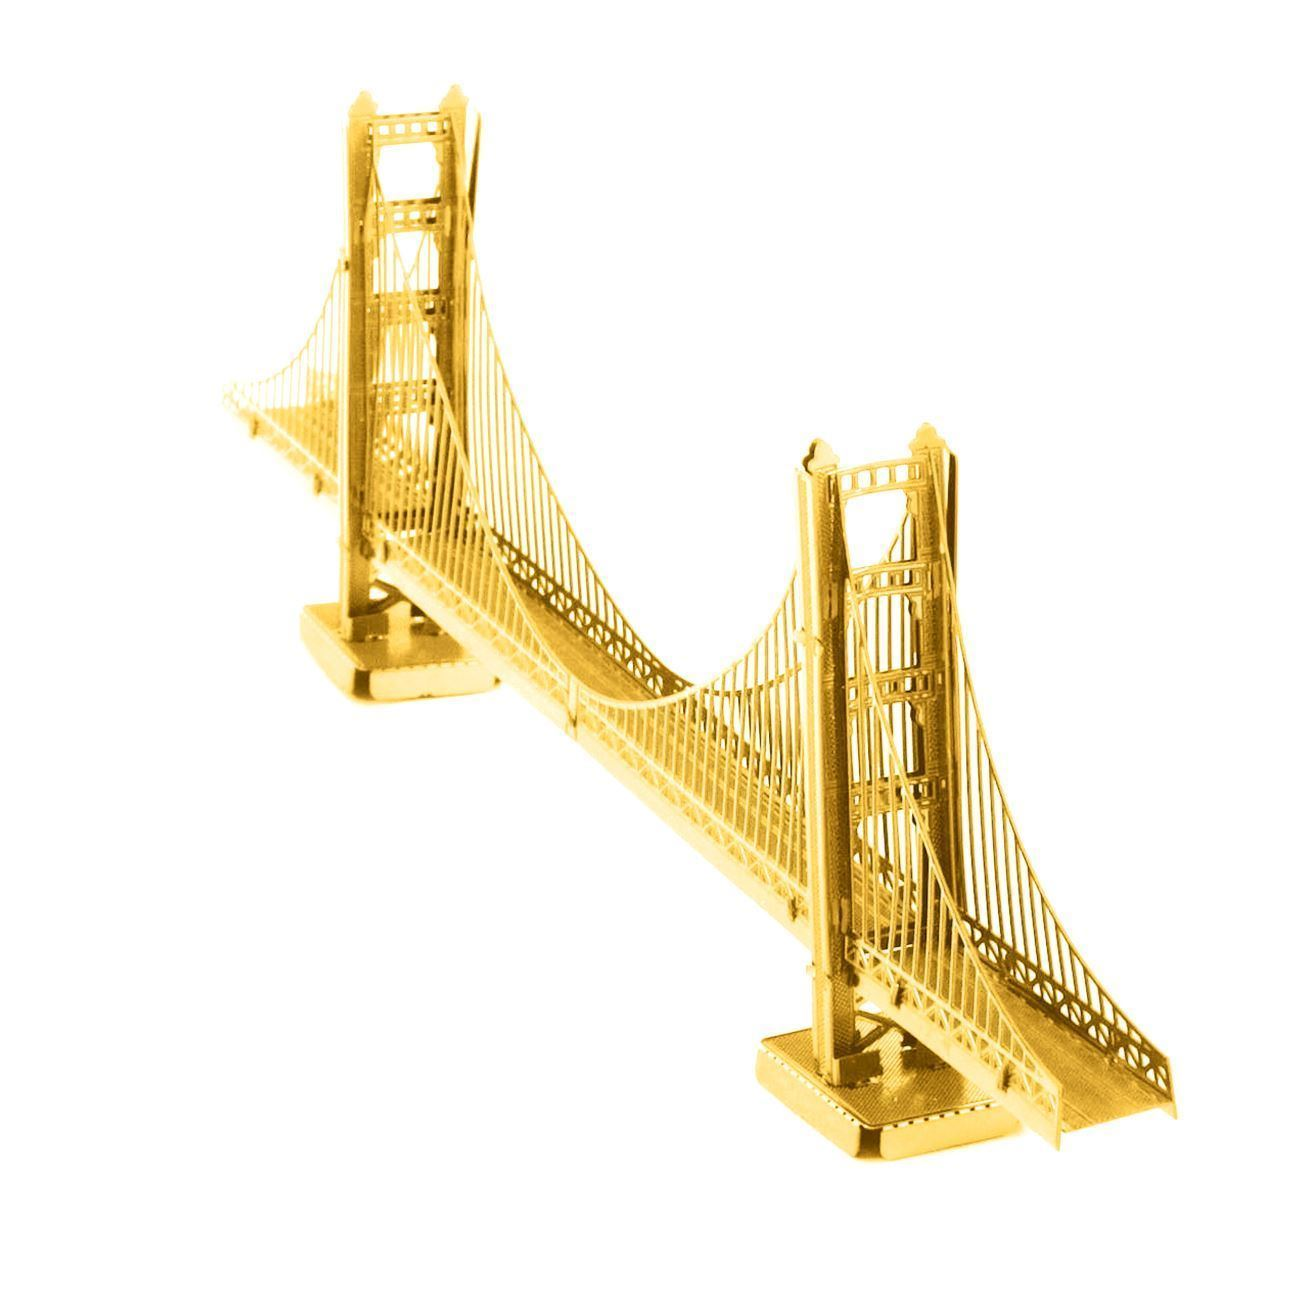 metal earth diy 3d metal model kits metal earth architecture gold golden gate bridge. Black Bedroom Furniture Sets. Home Design Ideas